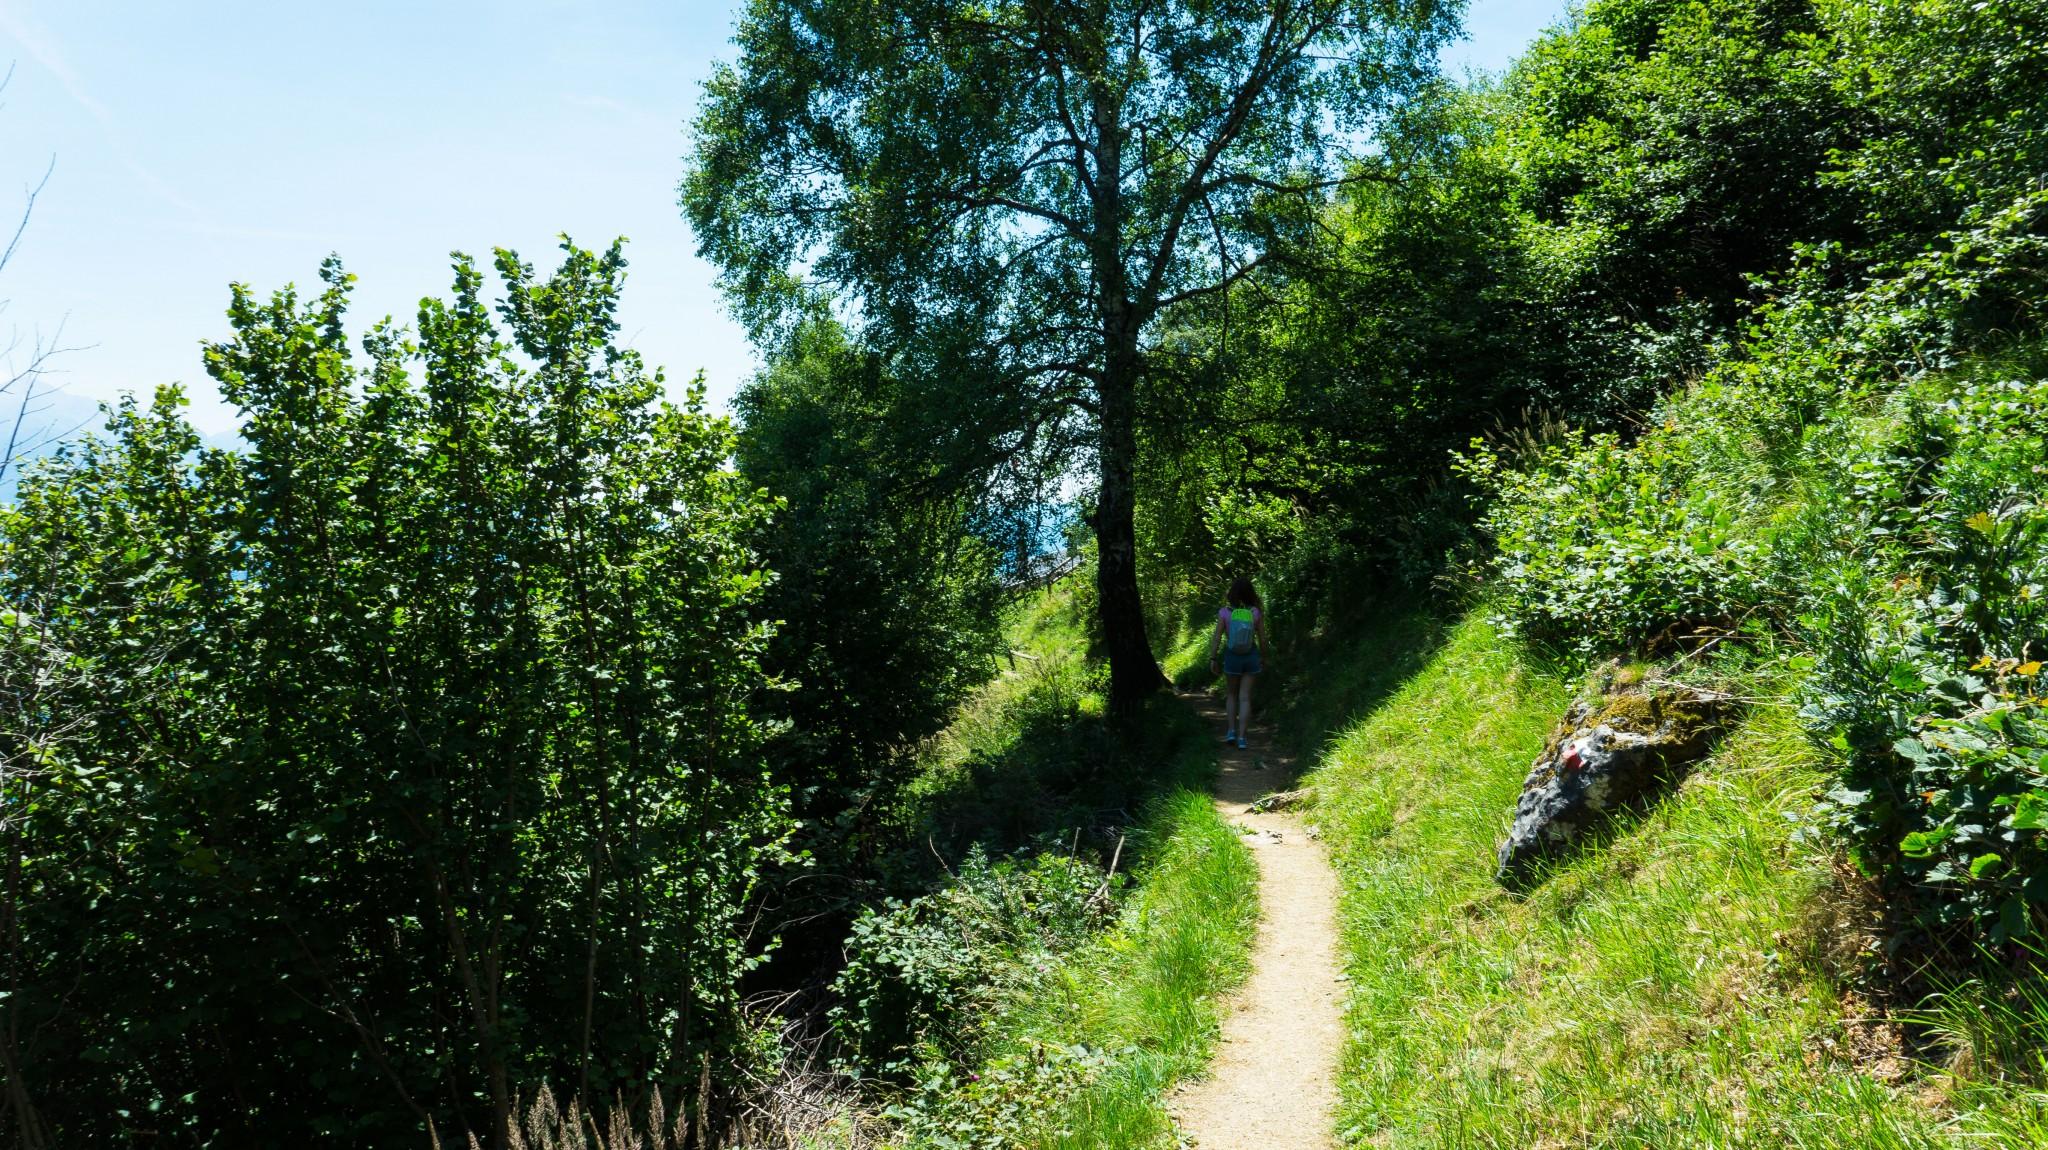 Италия: Озеро Комо - Rifugio Menaggio